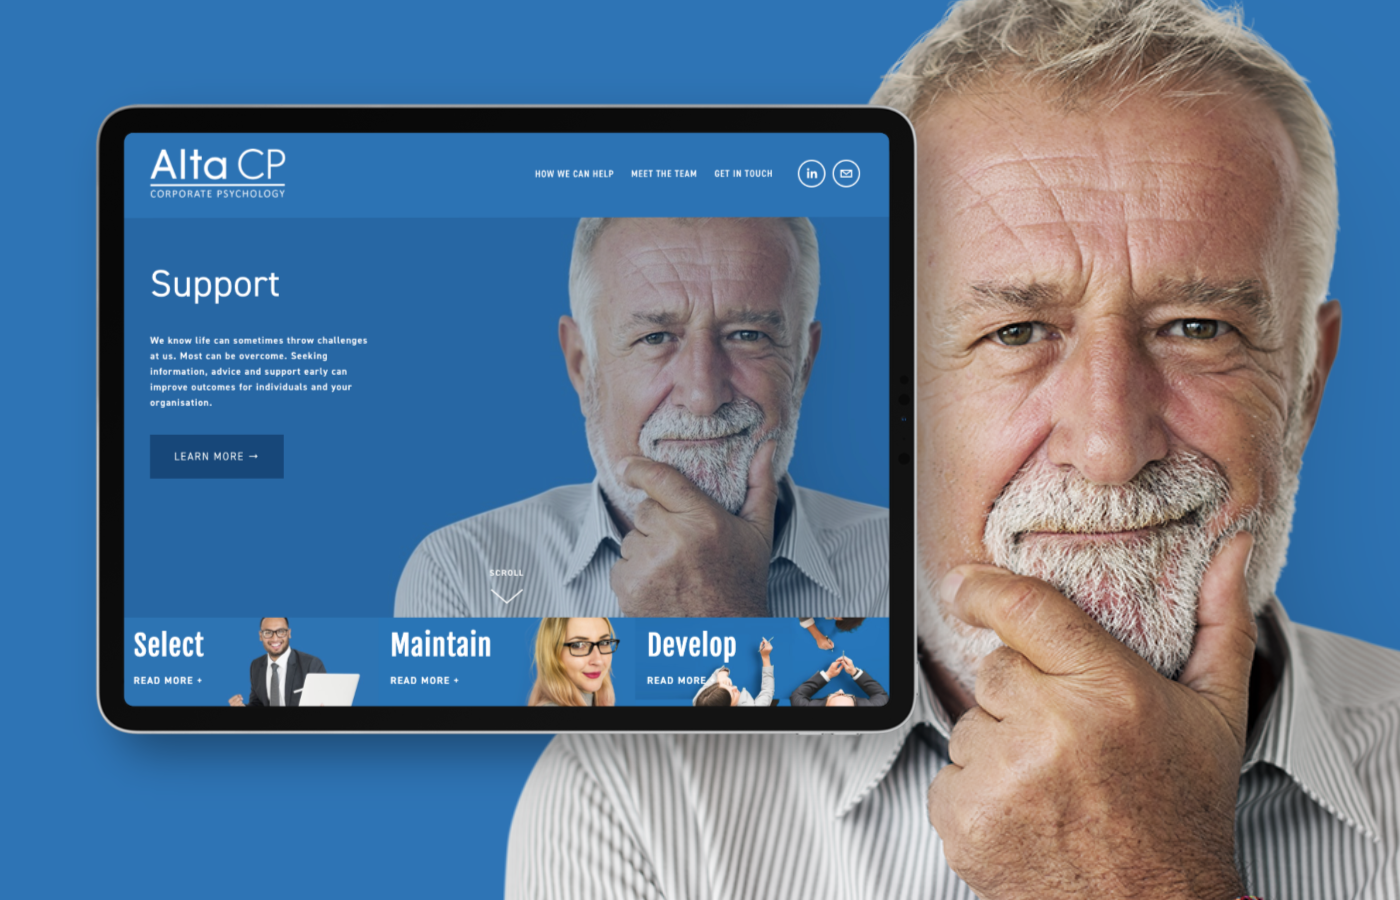 altacp-nomad-creative-digital-design.png